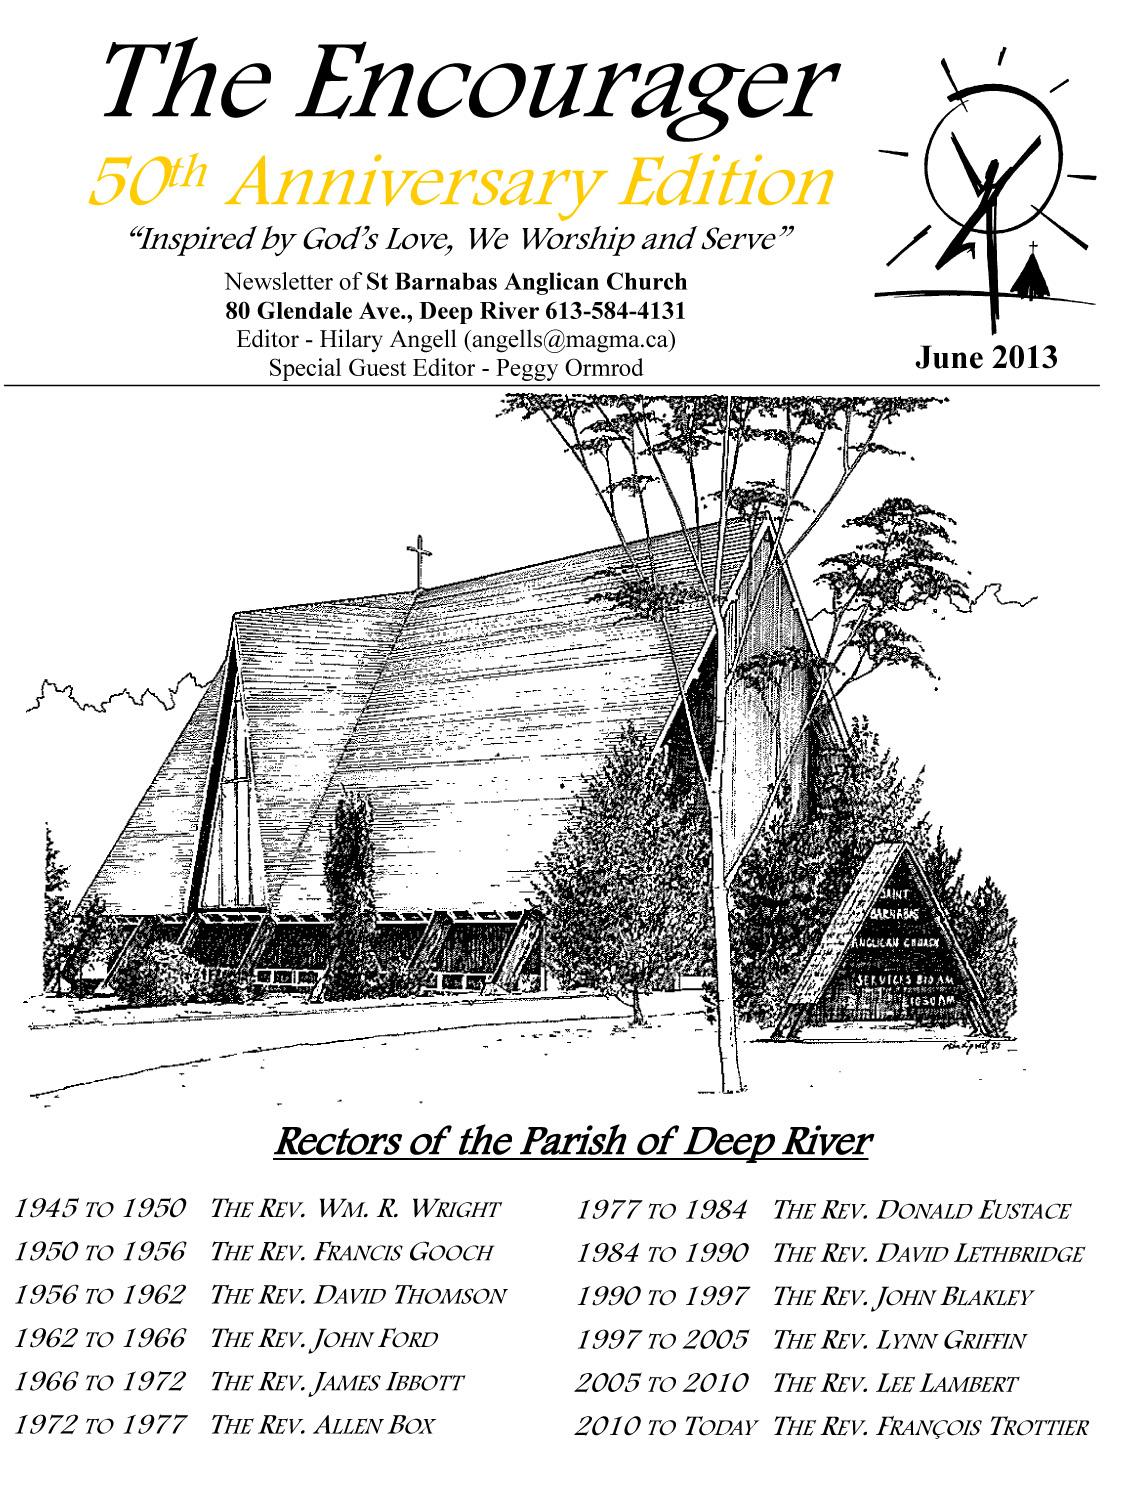 St. Barnabas Anglican Church: June 2013